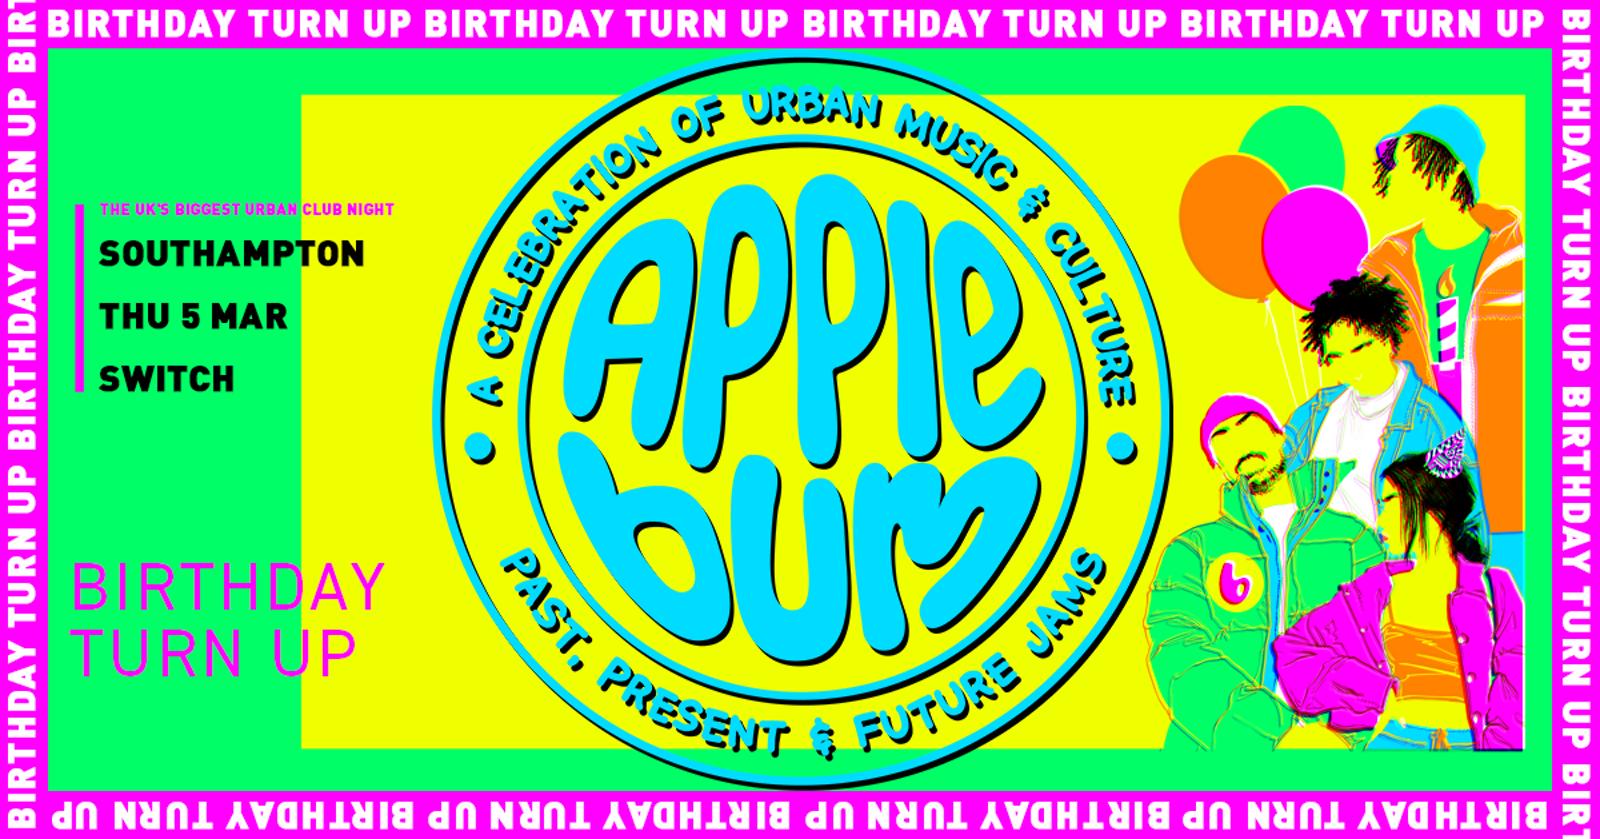 Applebum / Southampton / Birthday Turn Up